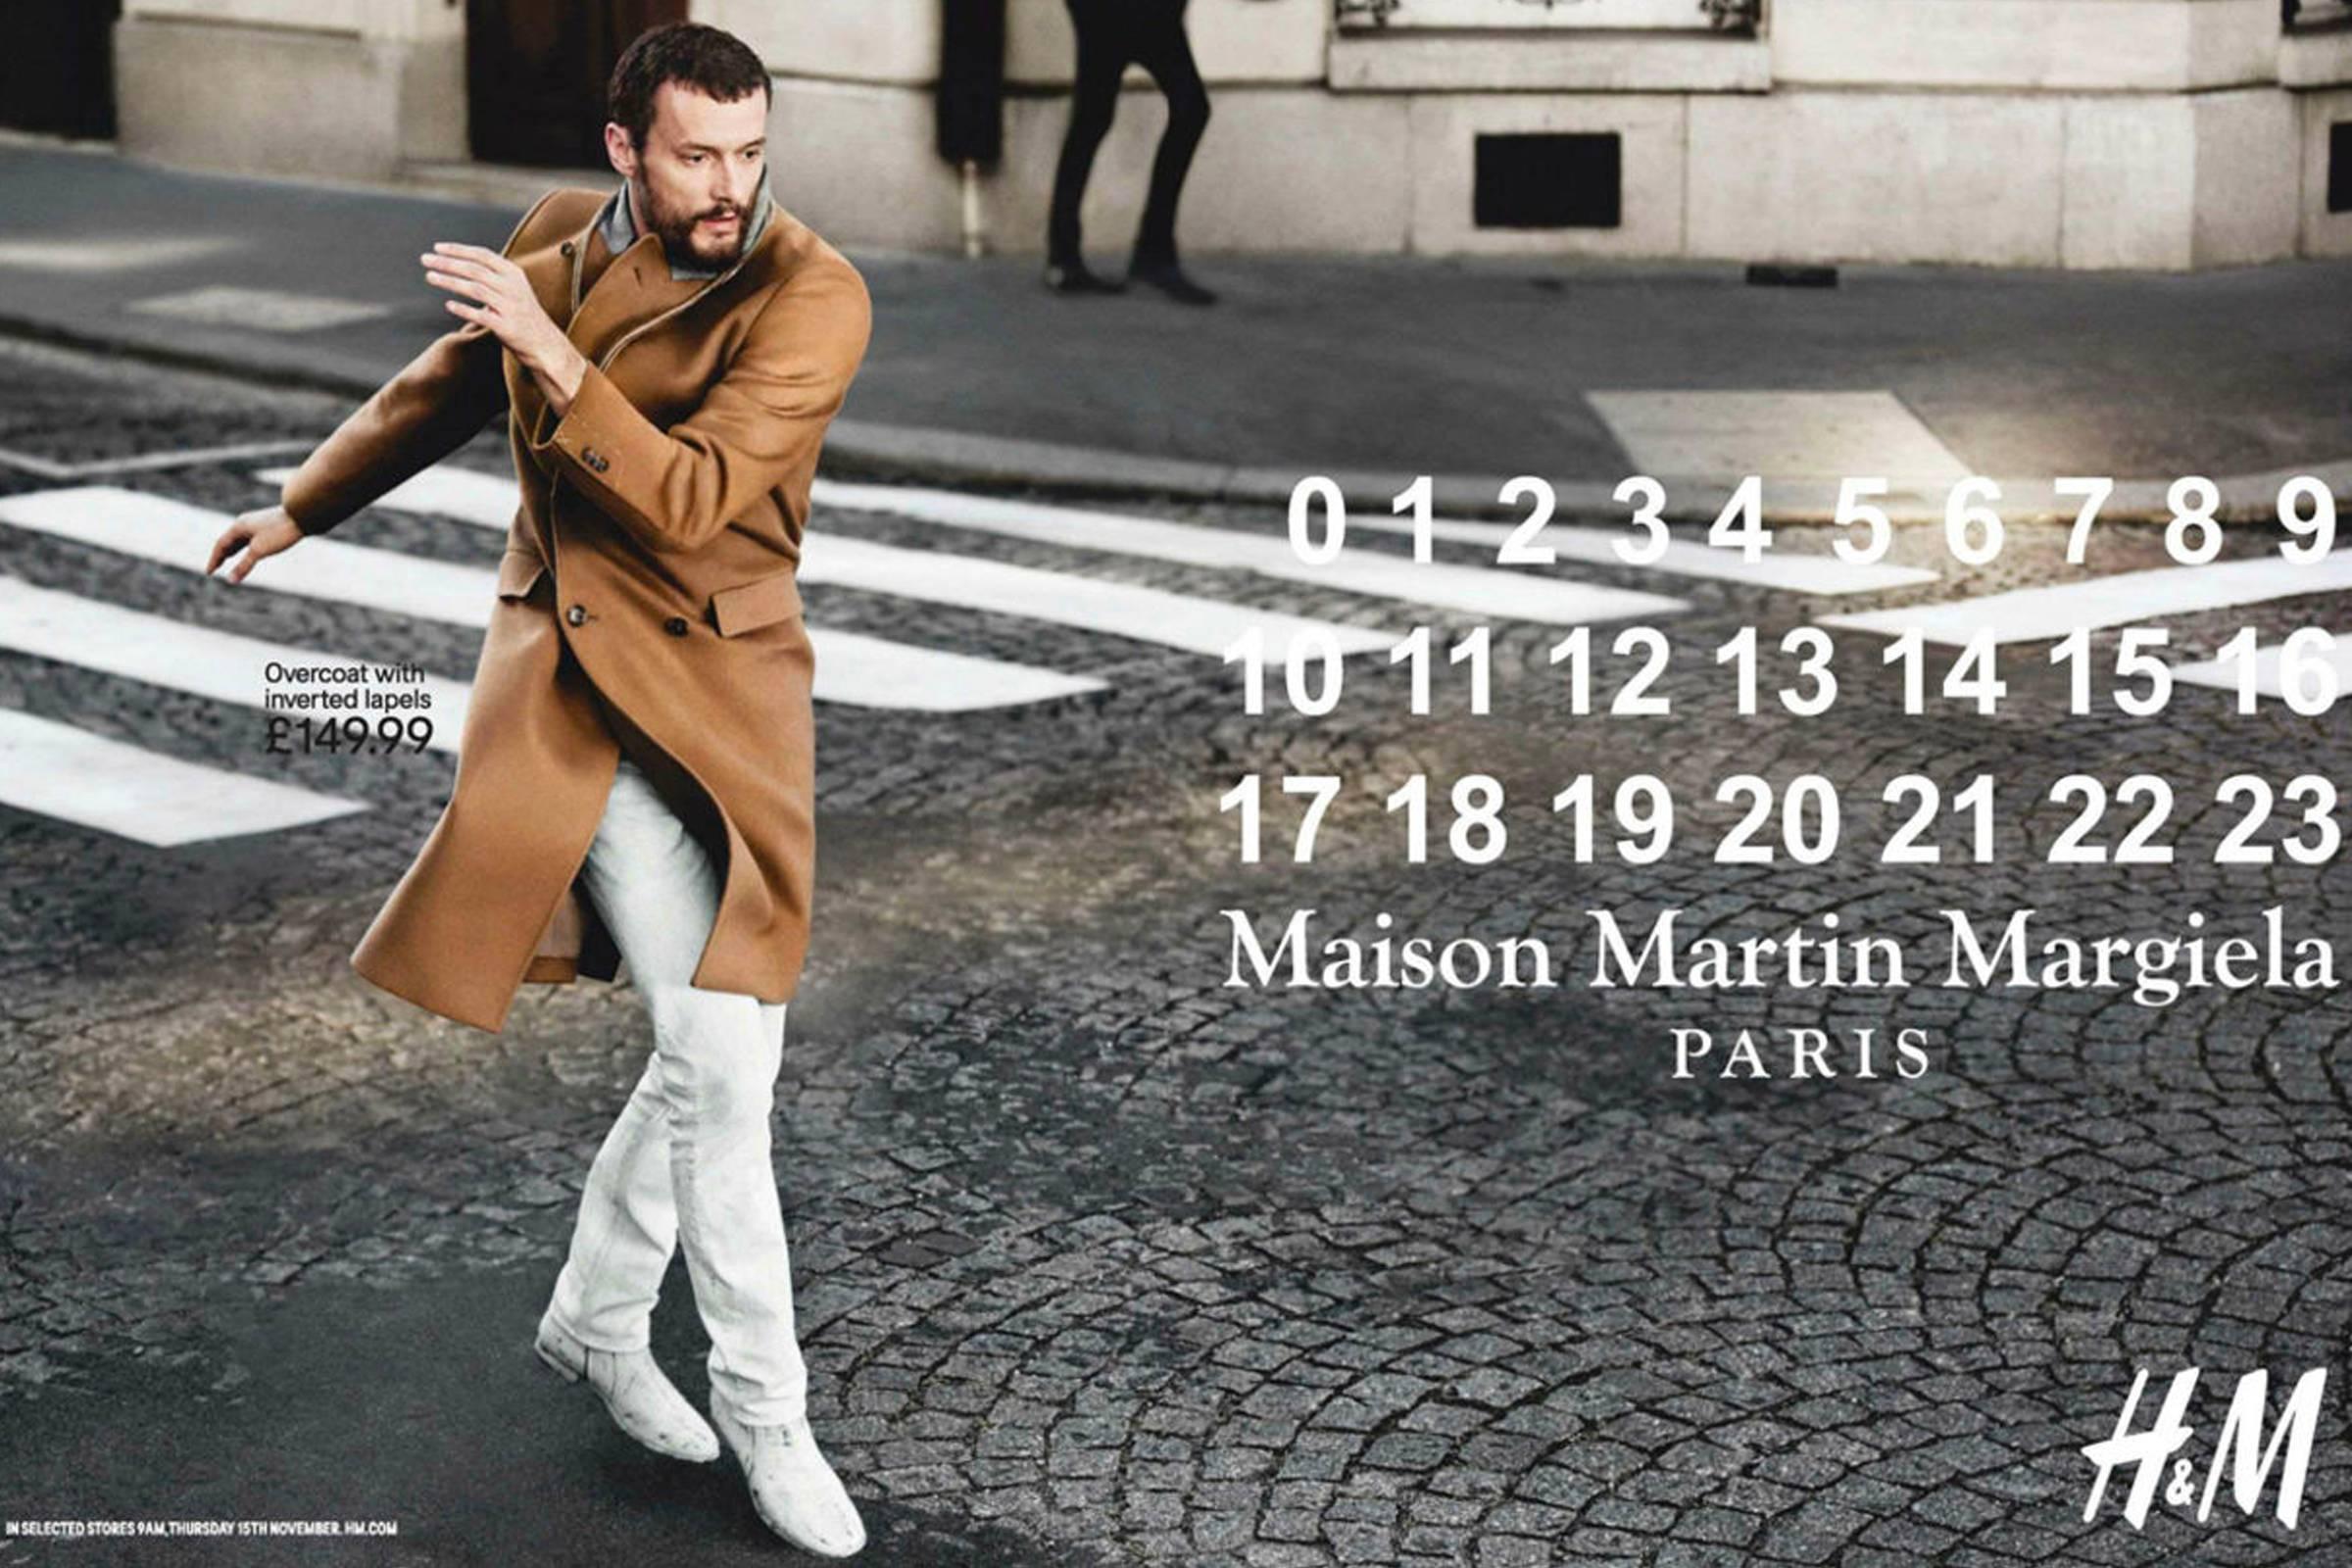 Maison Martin Margiela x H&M (2013)